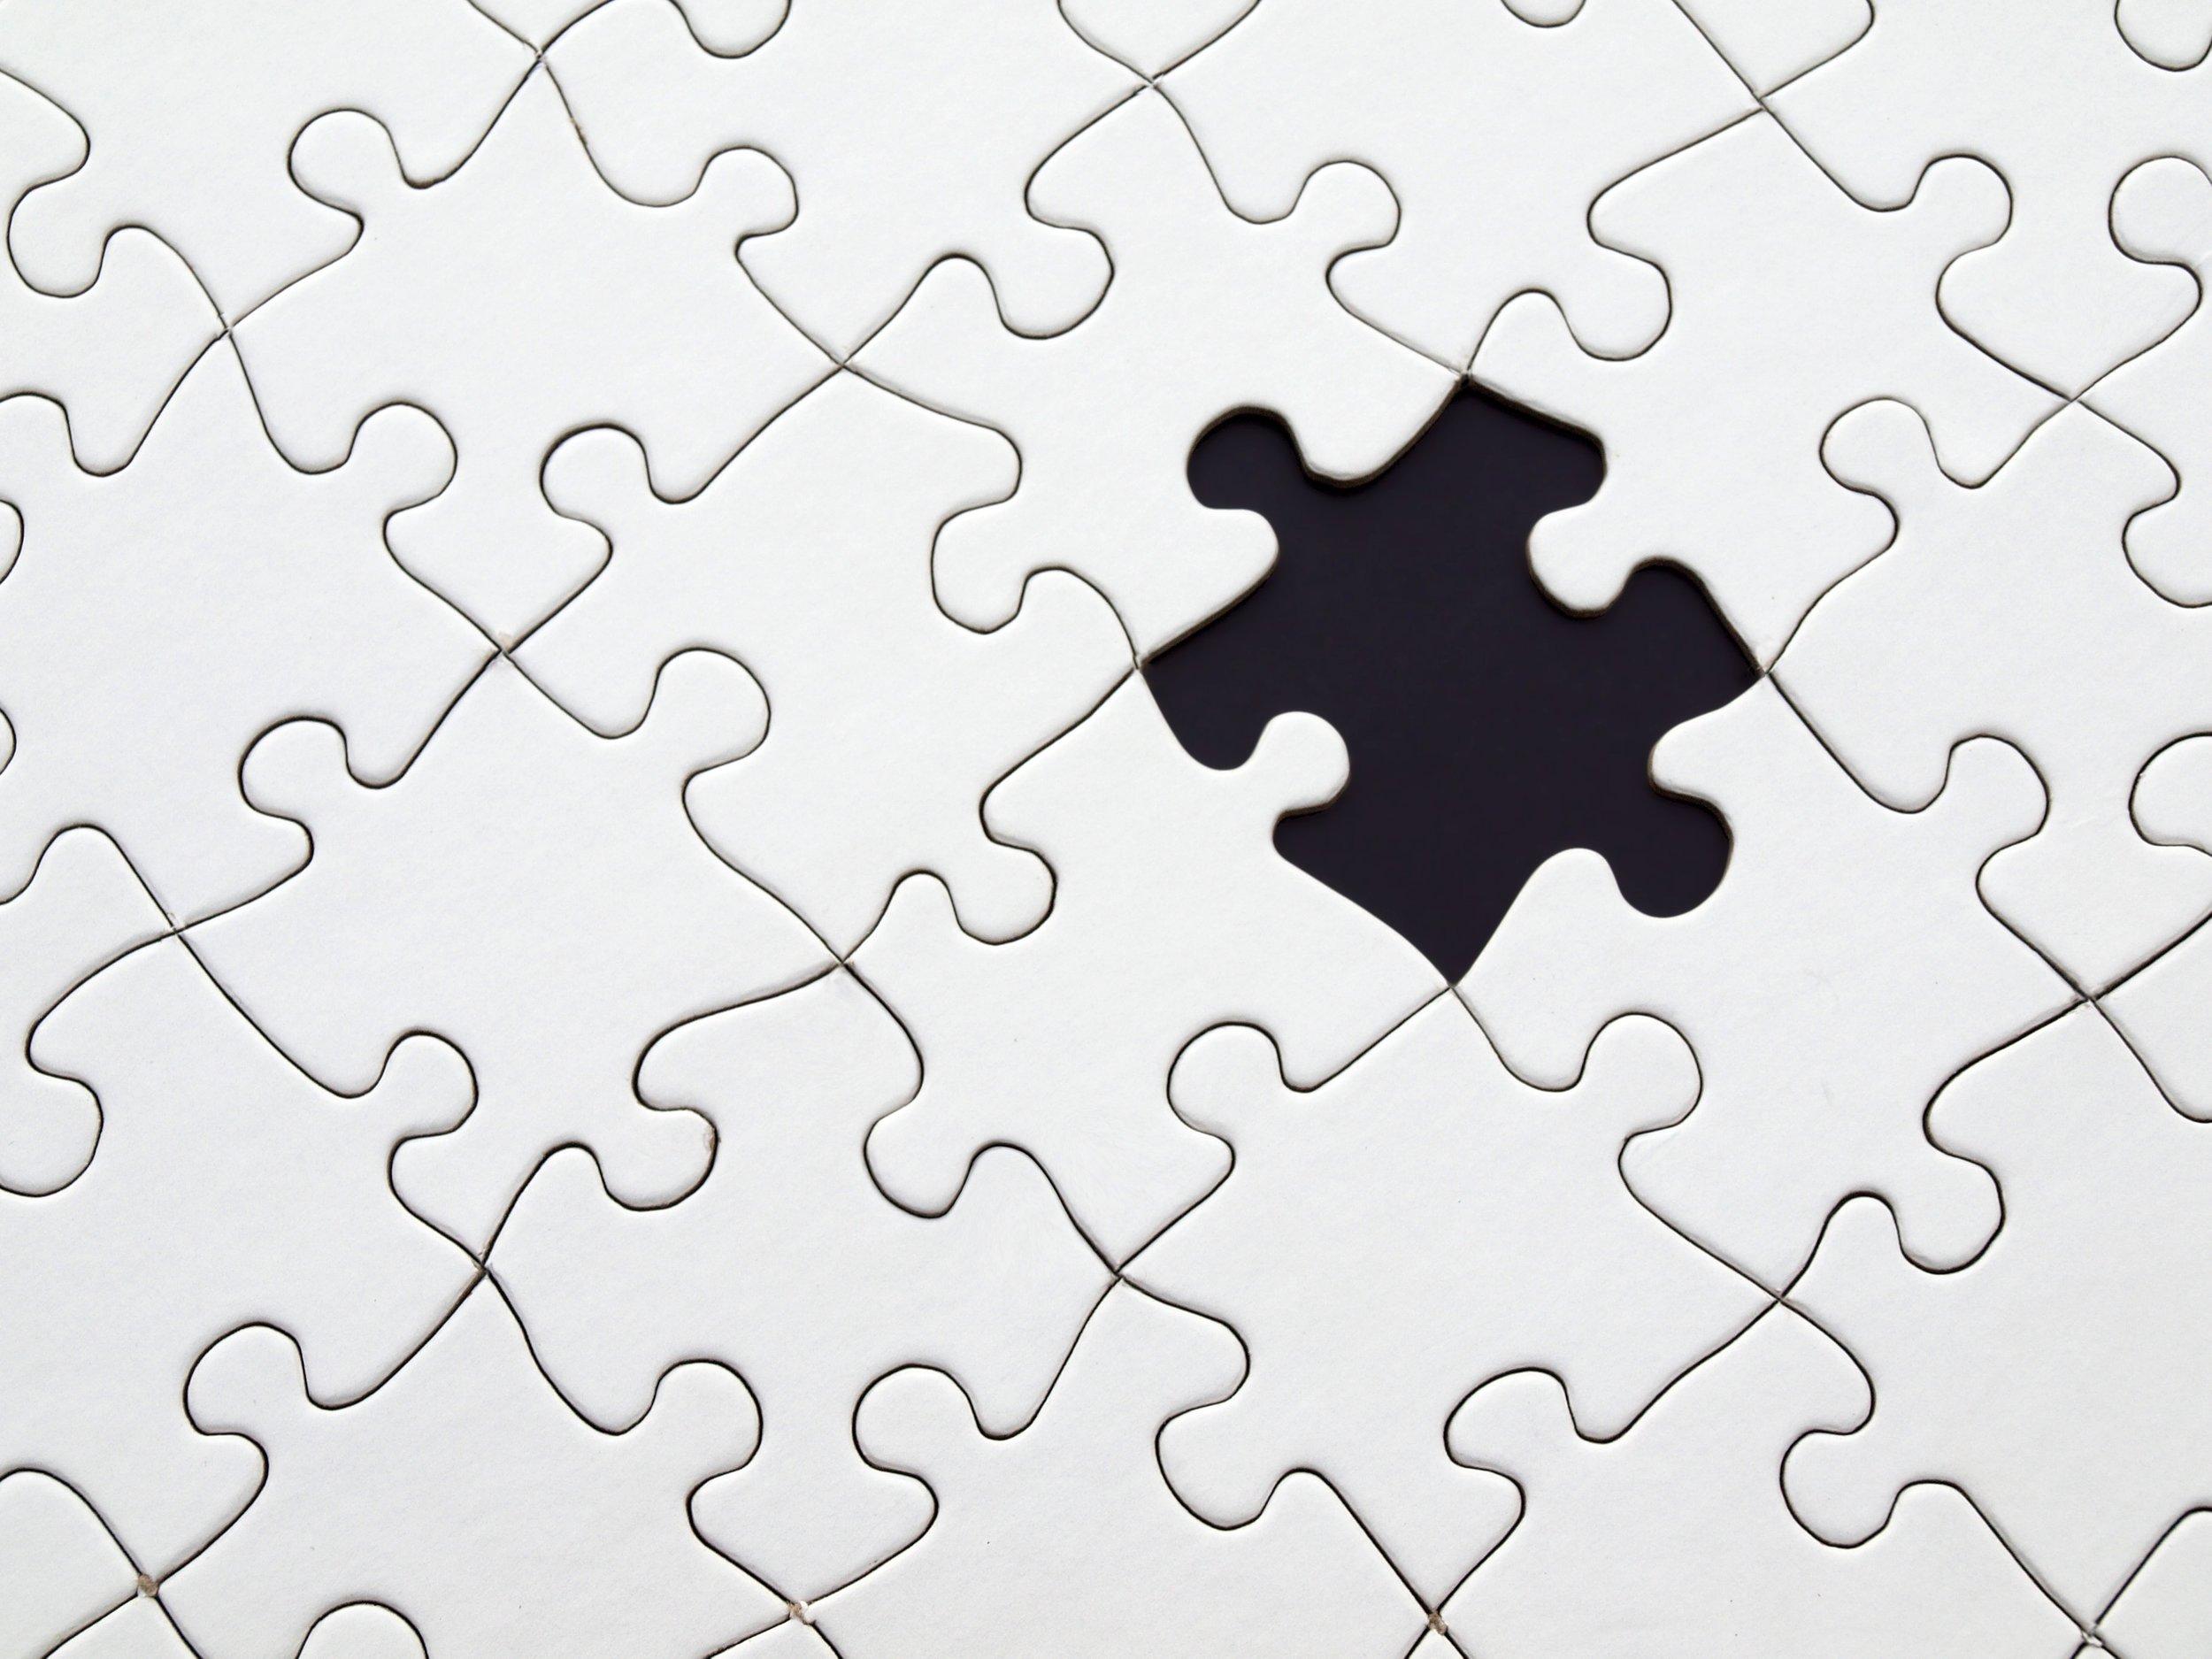 puzzle piece.jpeg